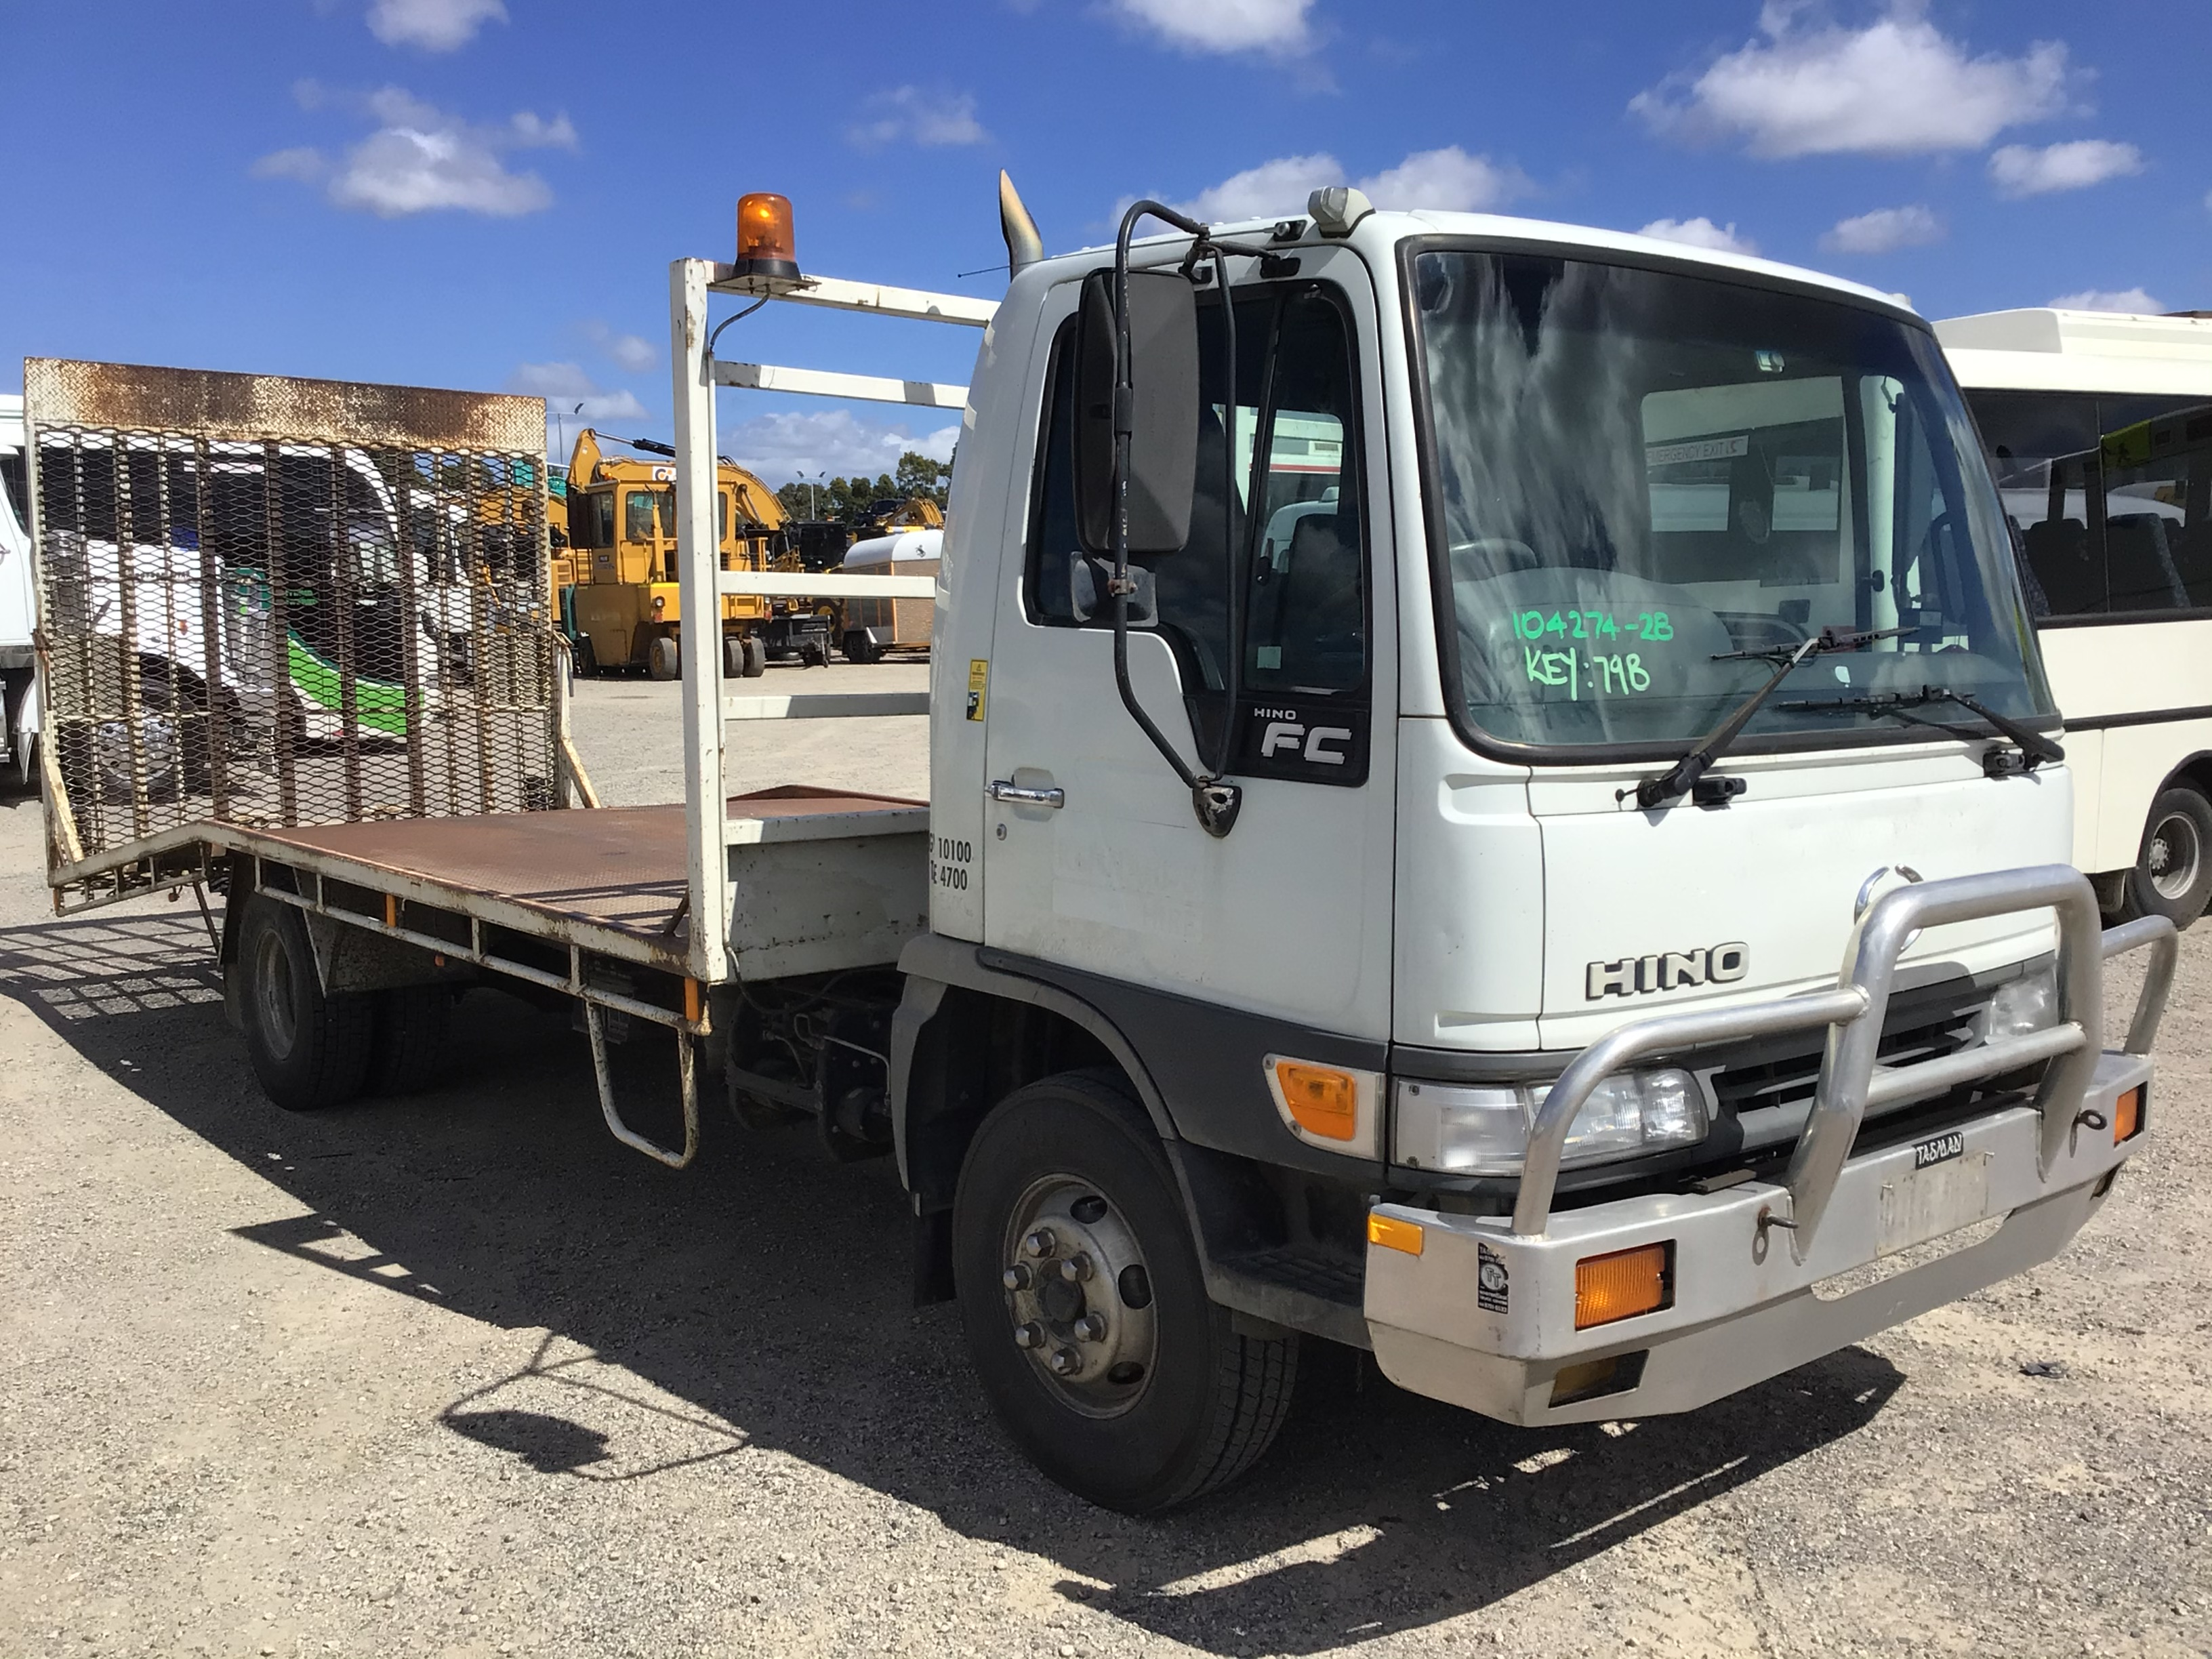 2000 Hino FC3J Ser C/Cab 4 x 2 Beavertail Truck